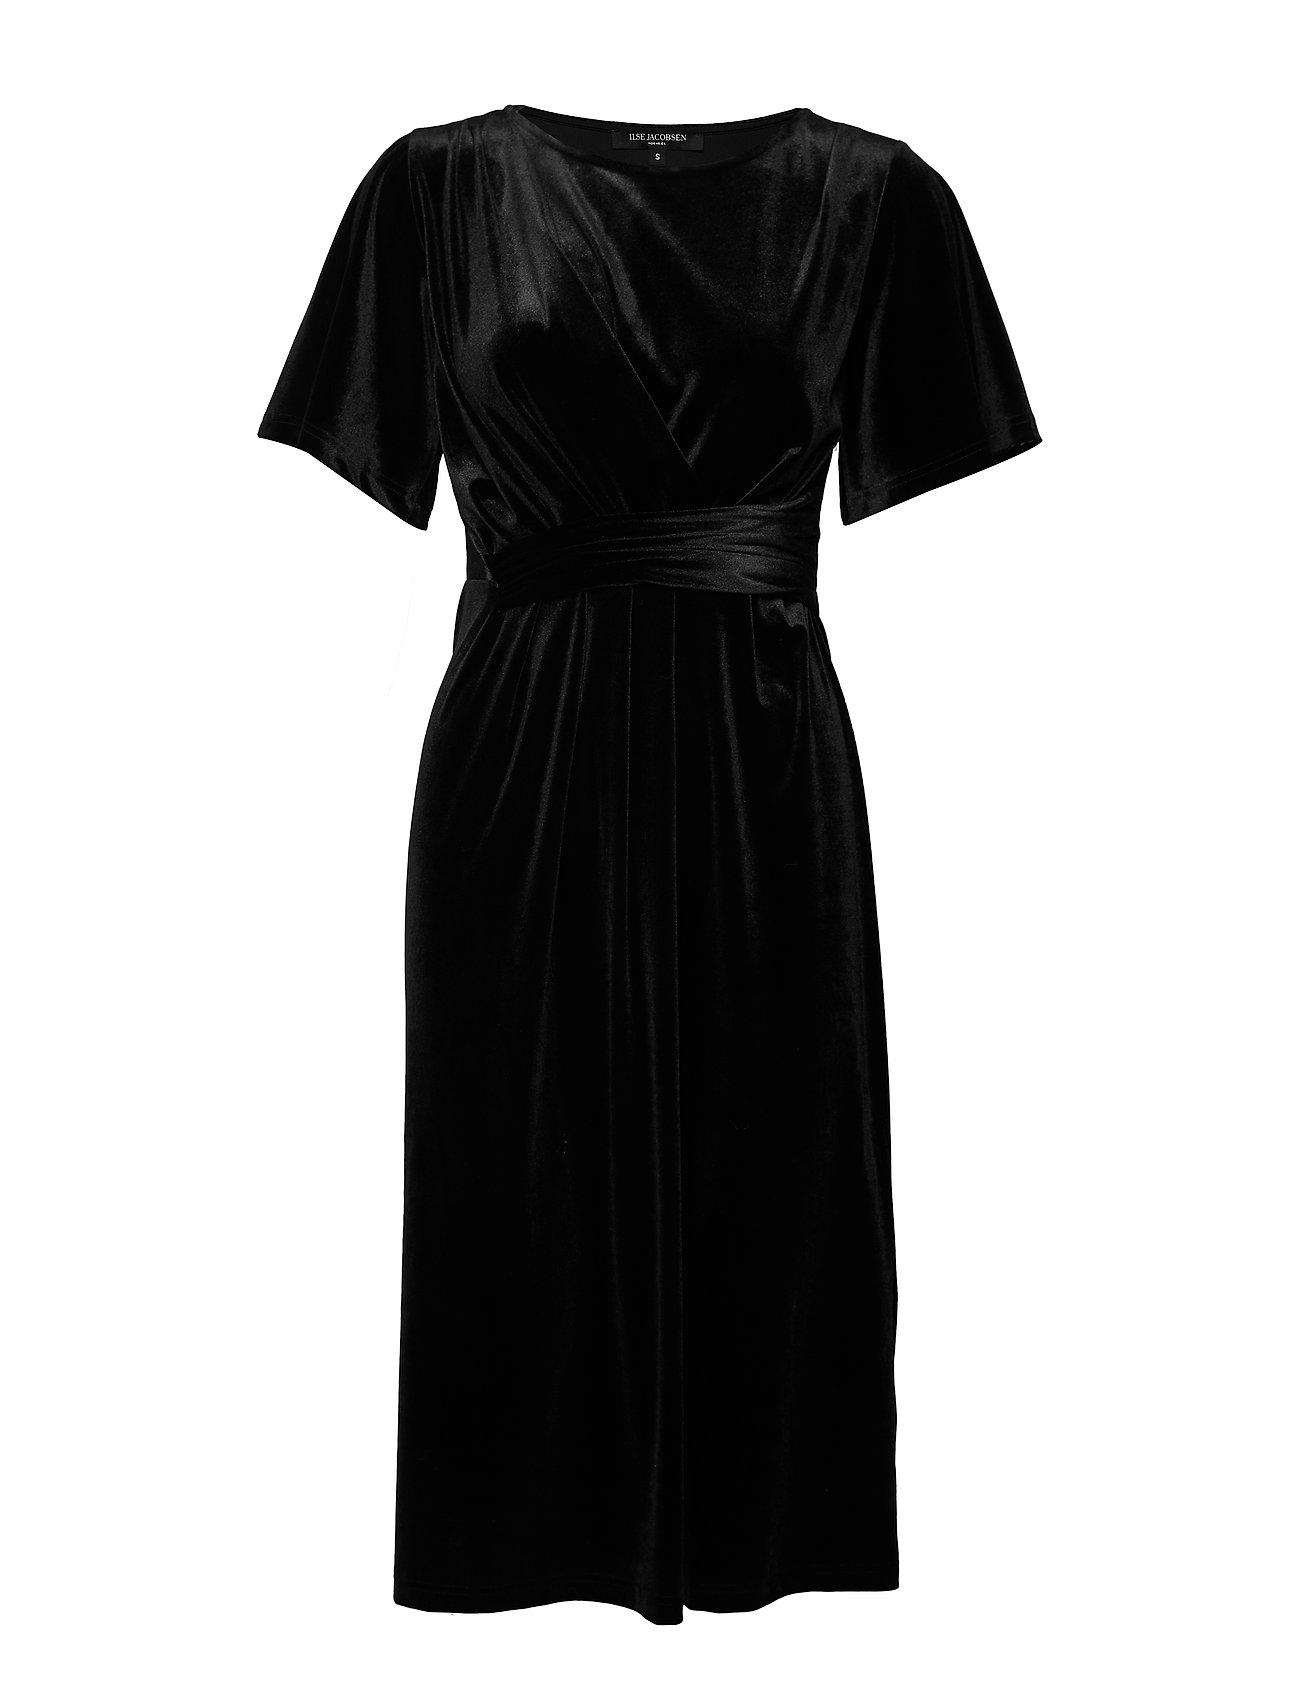 Ilse Jacobsen DRESS - BLACK